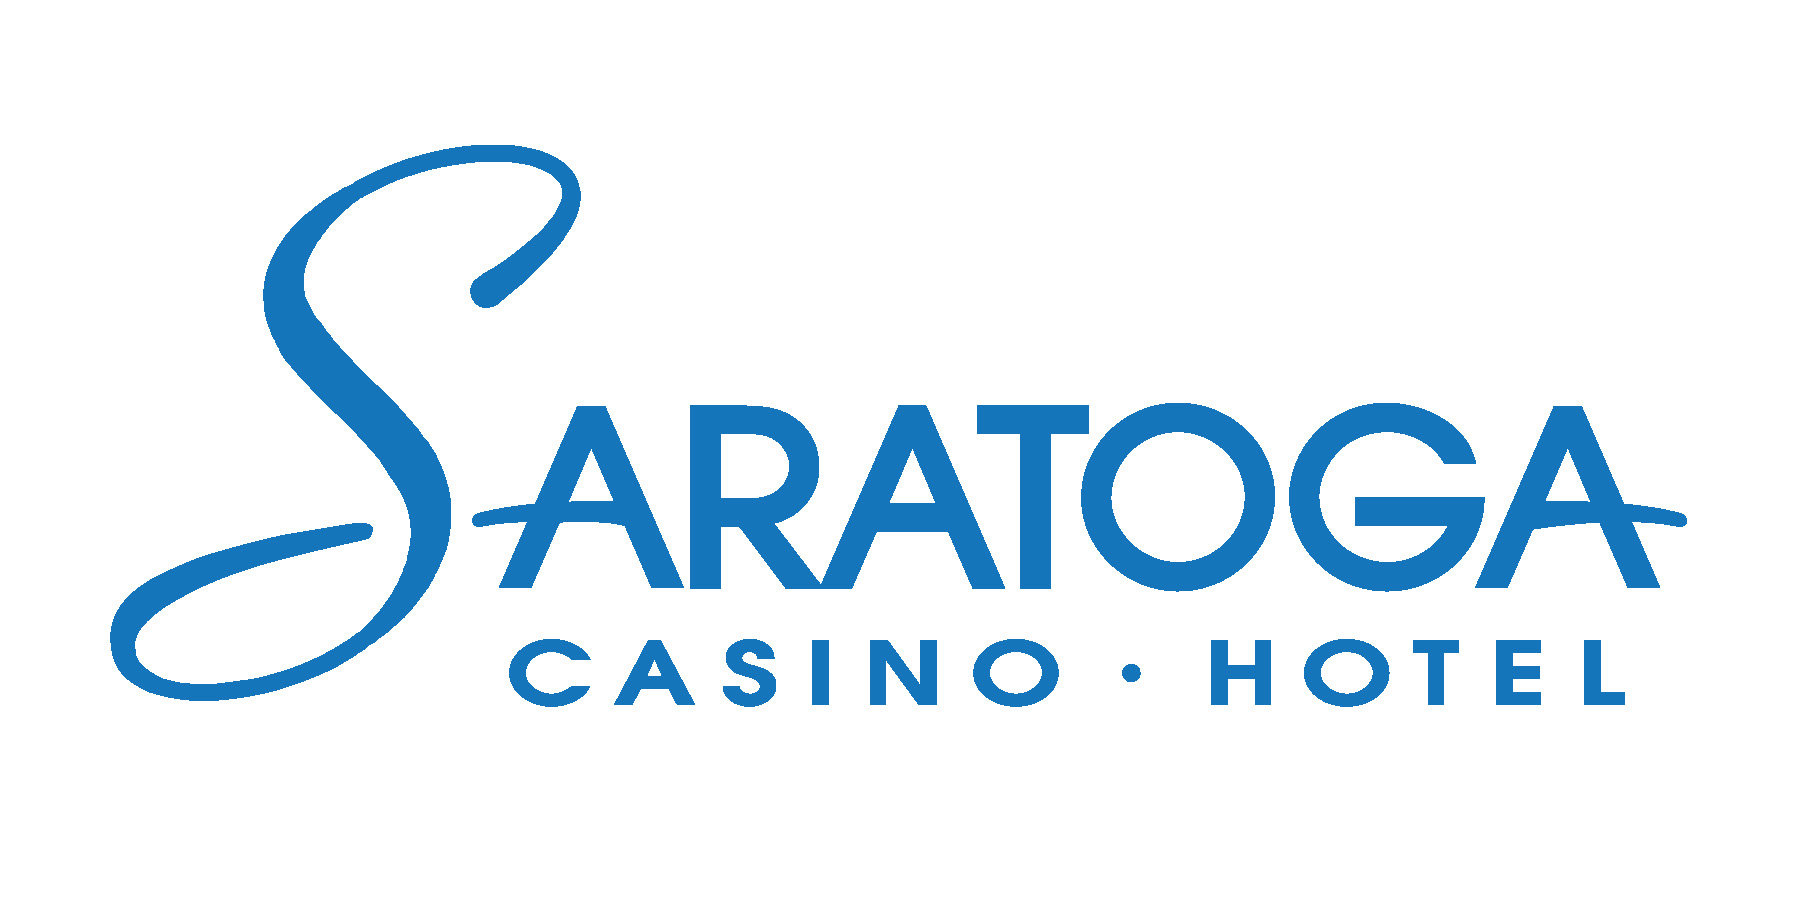 Nys gambling laws casino el in lucky oklahoma reno star